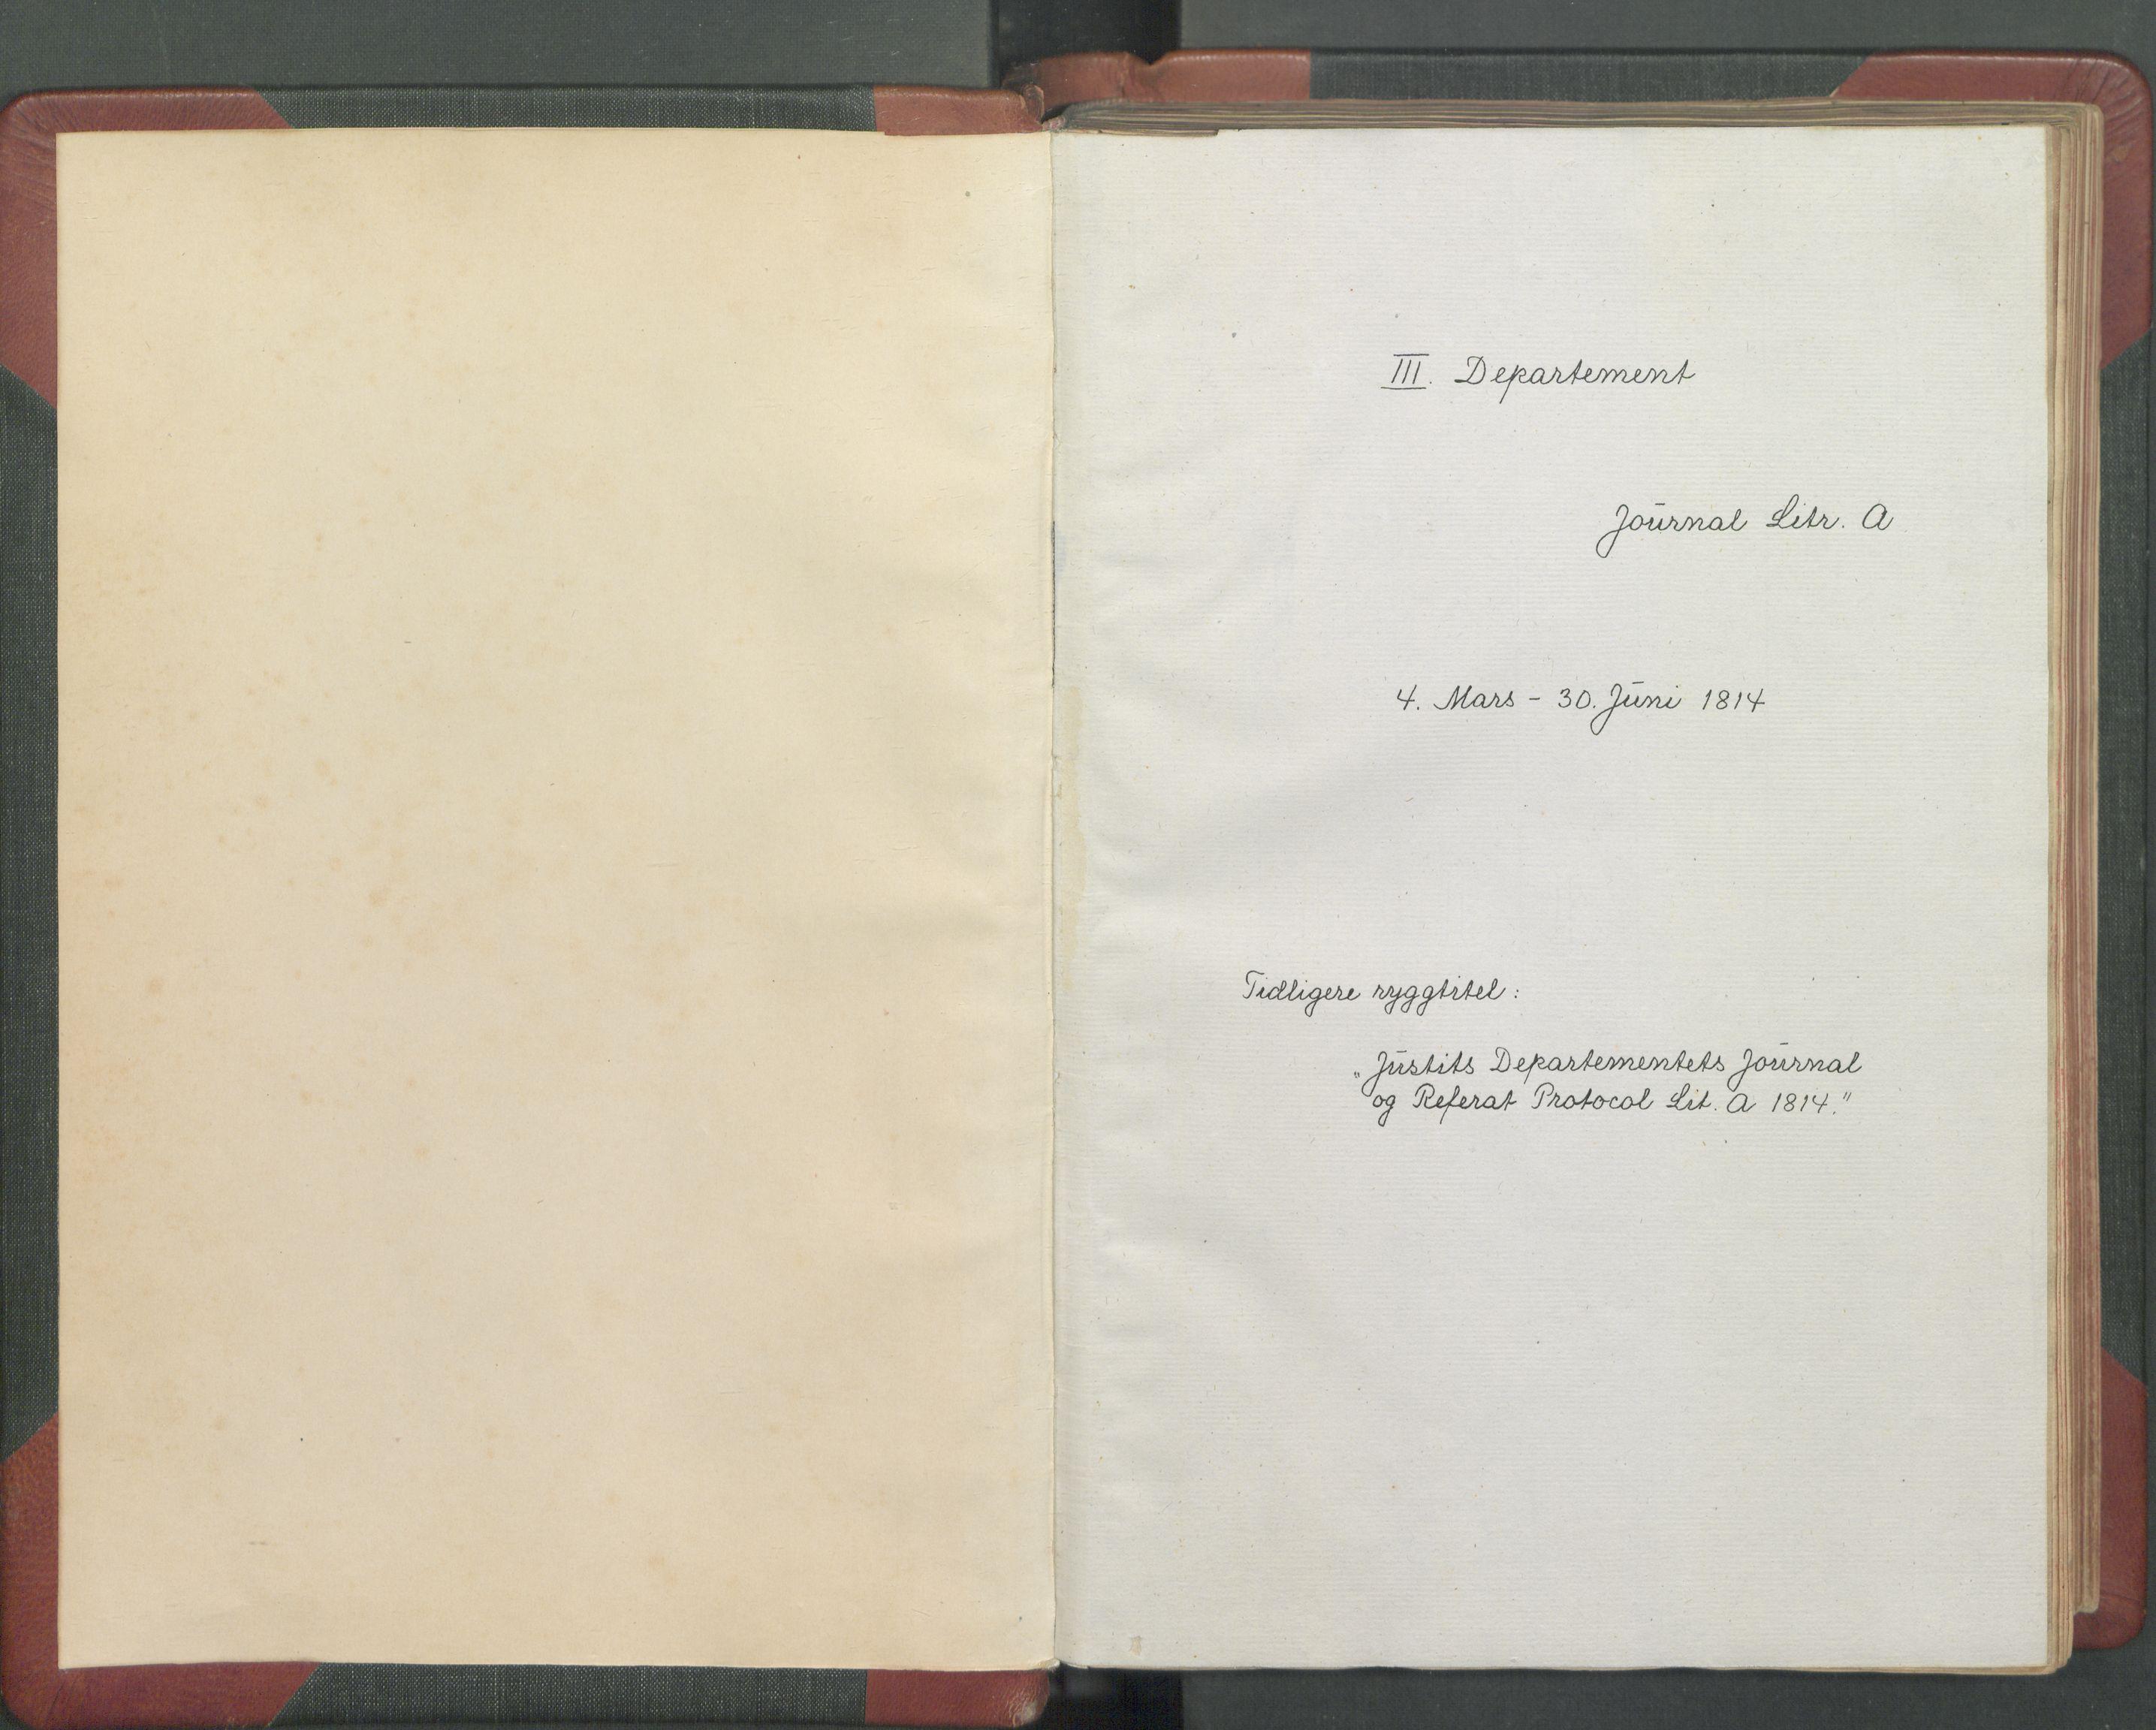 RA, Departementene i 1814, Fc/L0039: Journal A, 1814, s. 3